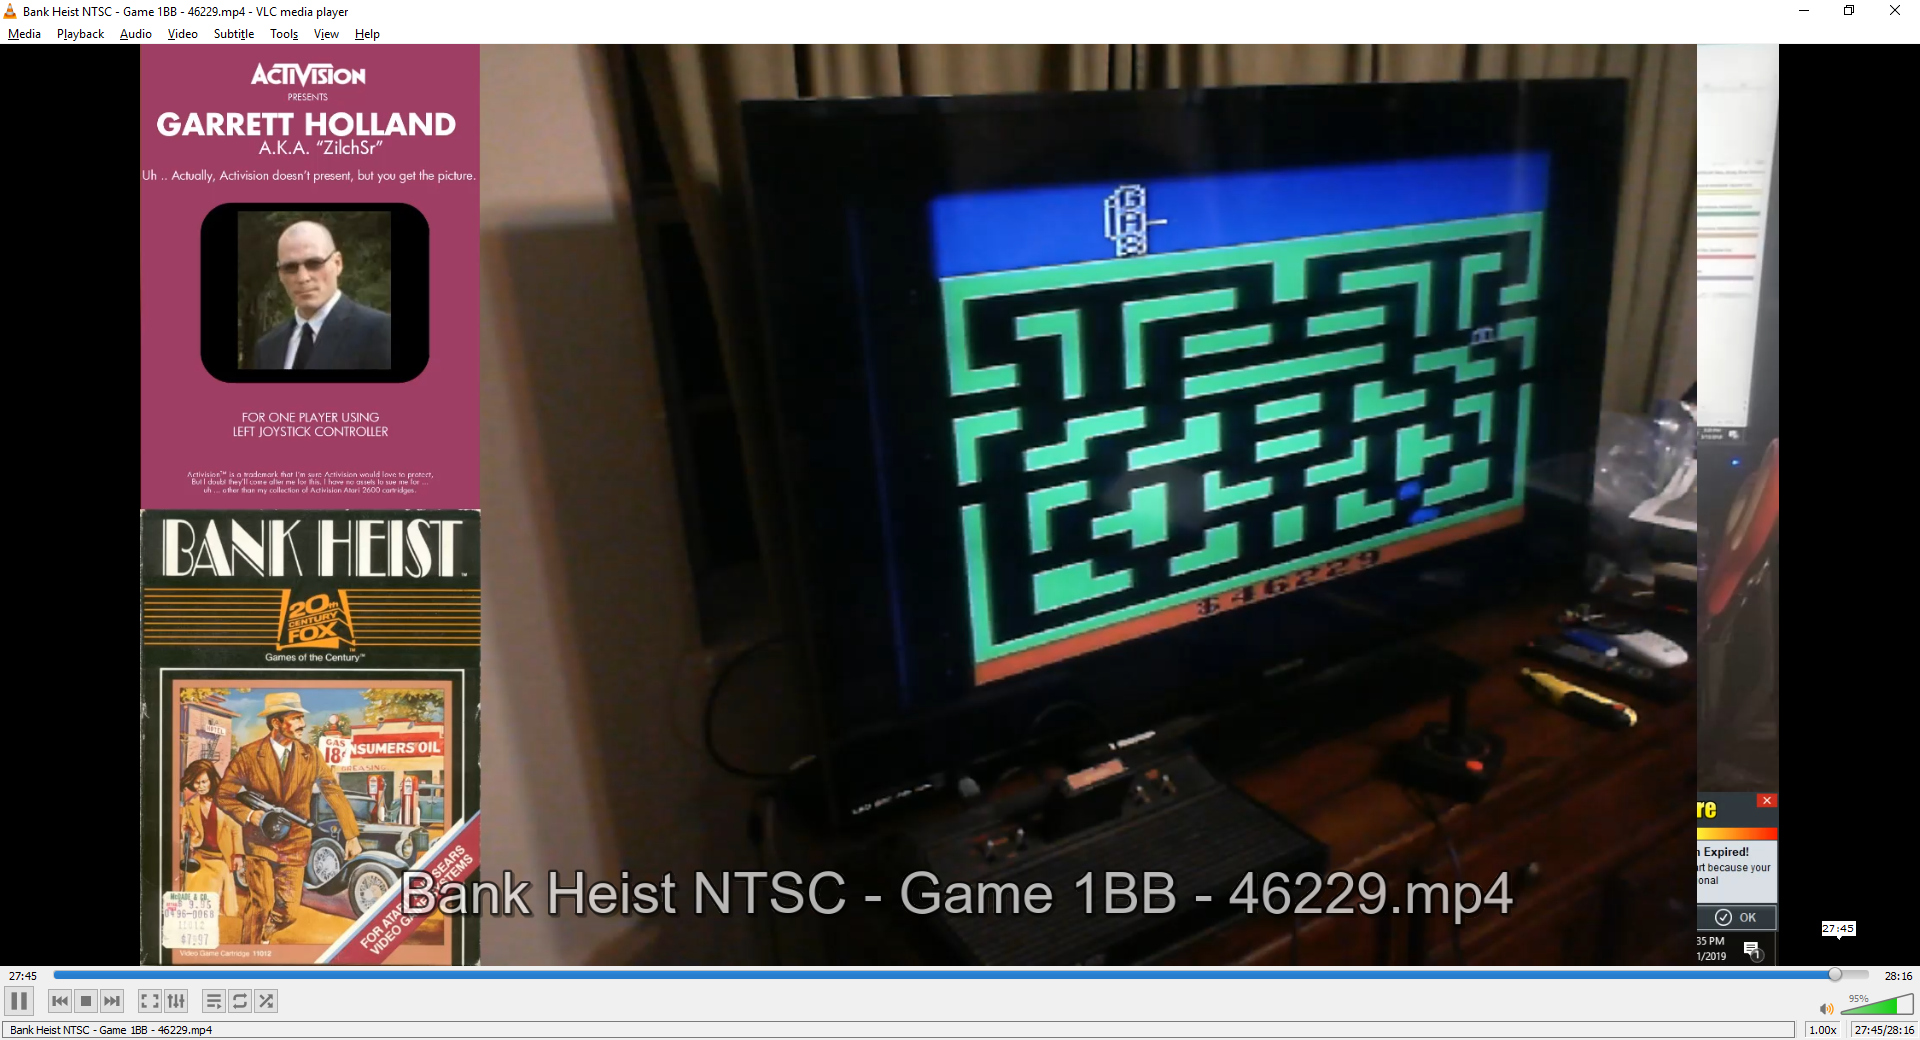 ZilchSr: Bank Heist (Atari 2600 Novice/B) 46,229 points on 2019-05-01 20:09:25